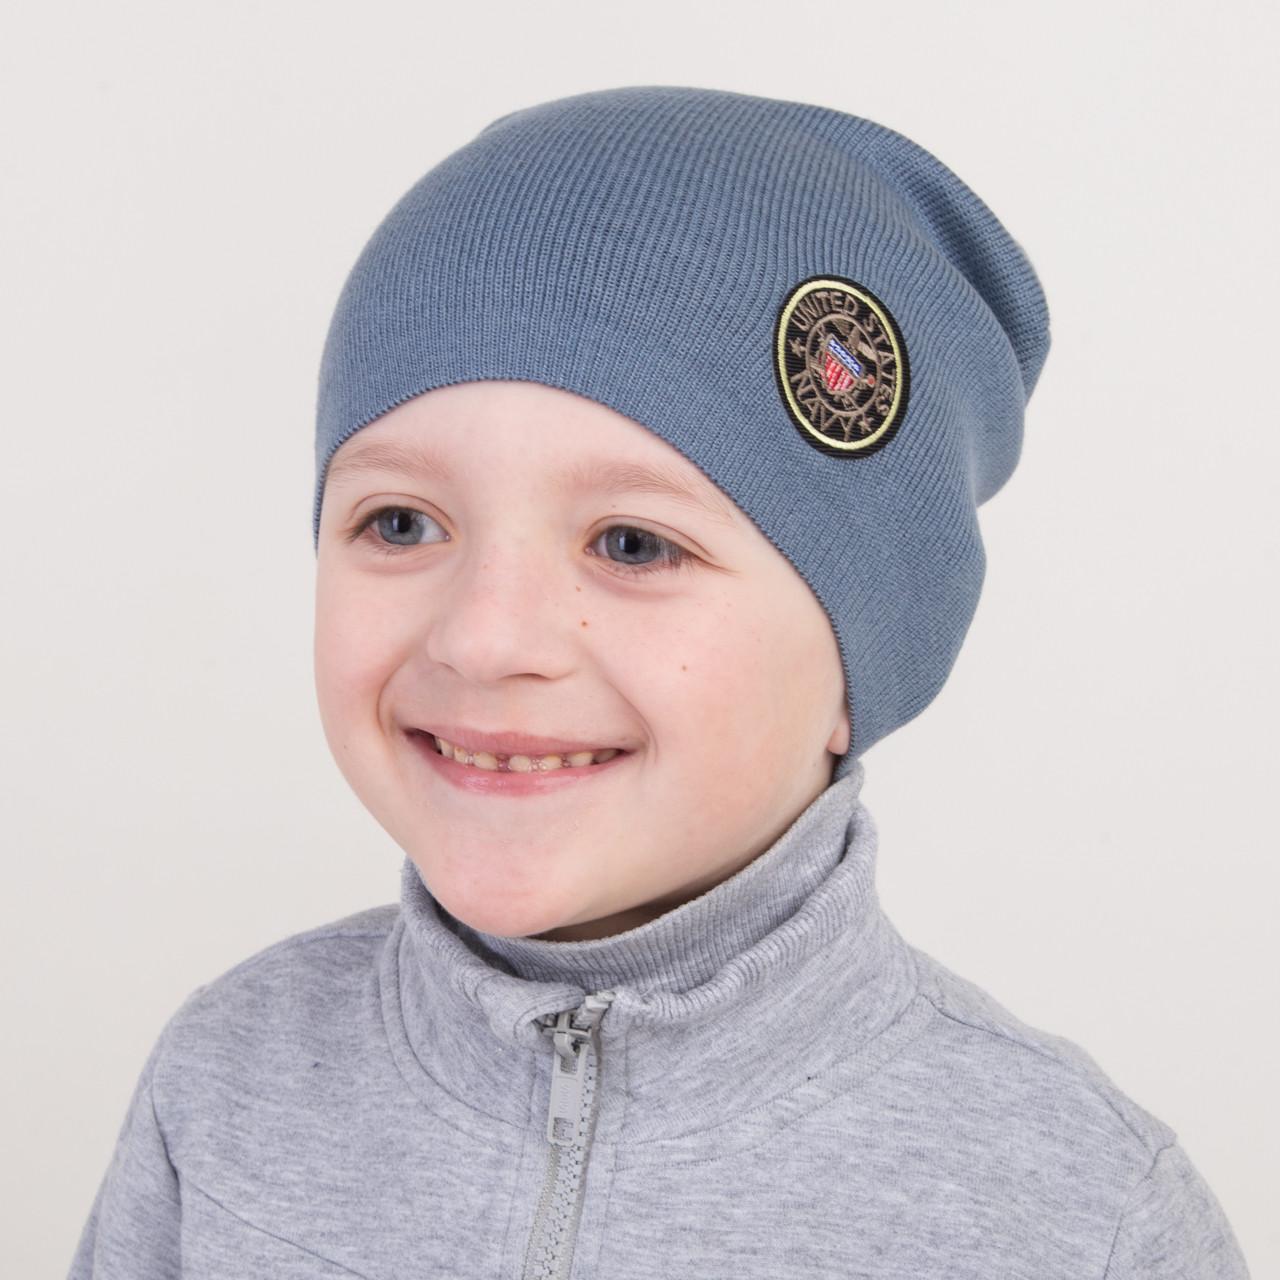 Брендовая весенняя шапка для мальчика оптом - Артикул 2272